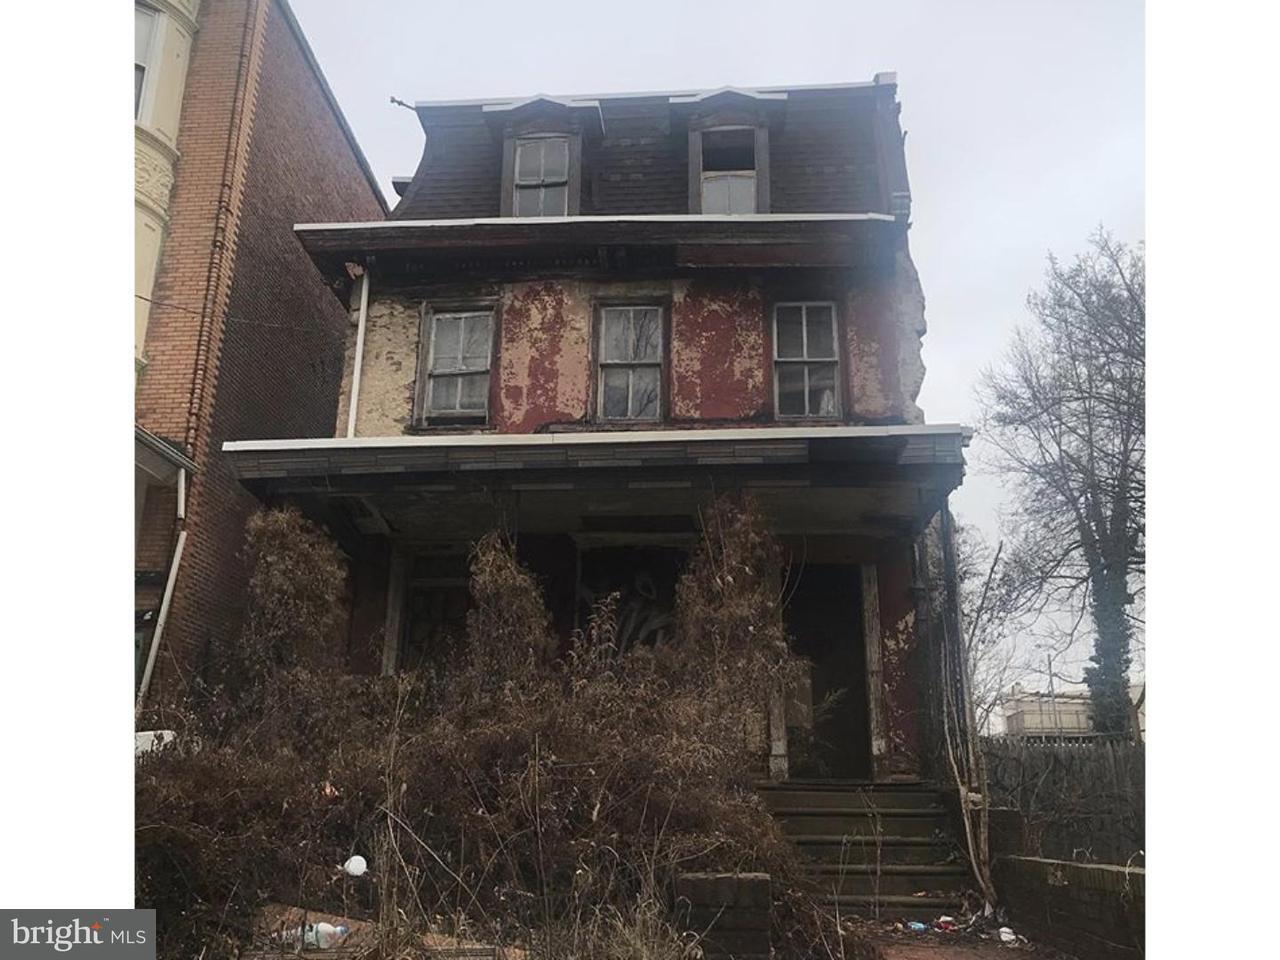 1709 W Tioga Philadelphia , PA 19140